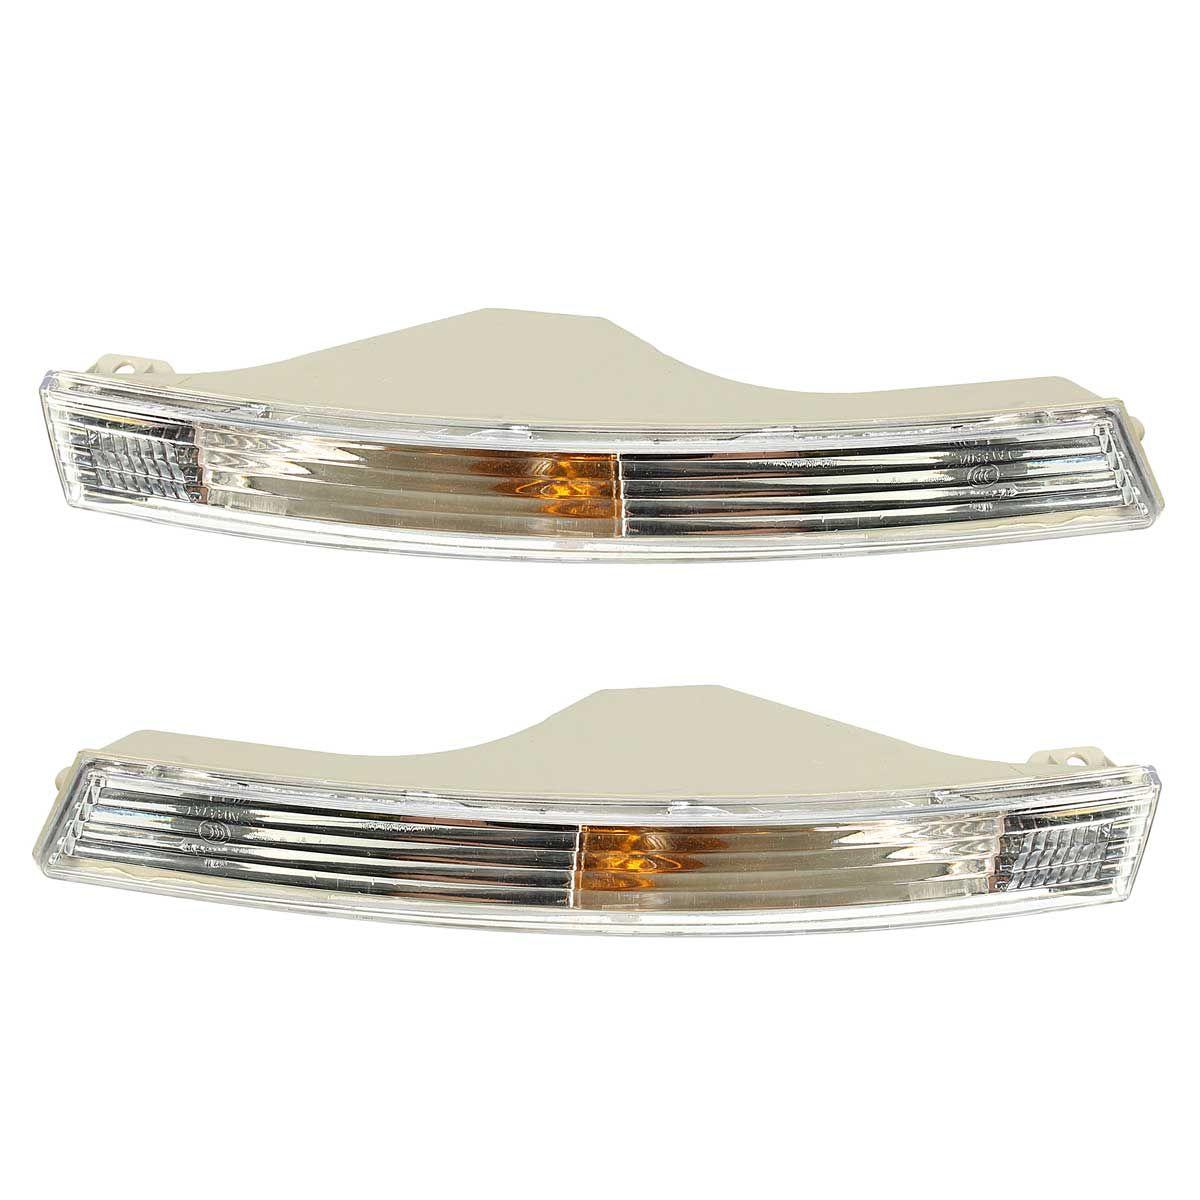 2 Pcs Car Front Bumper Turn Signals Light For Passat B6 For VW/Volkswagen/Magotan 2006-2010